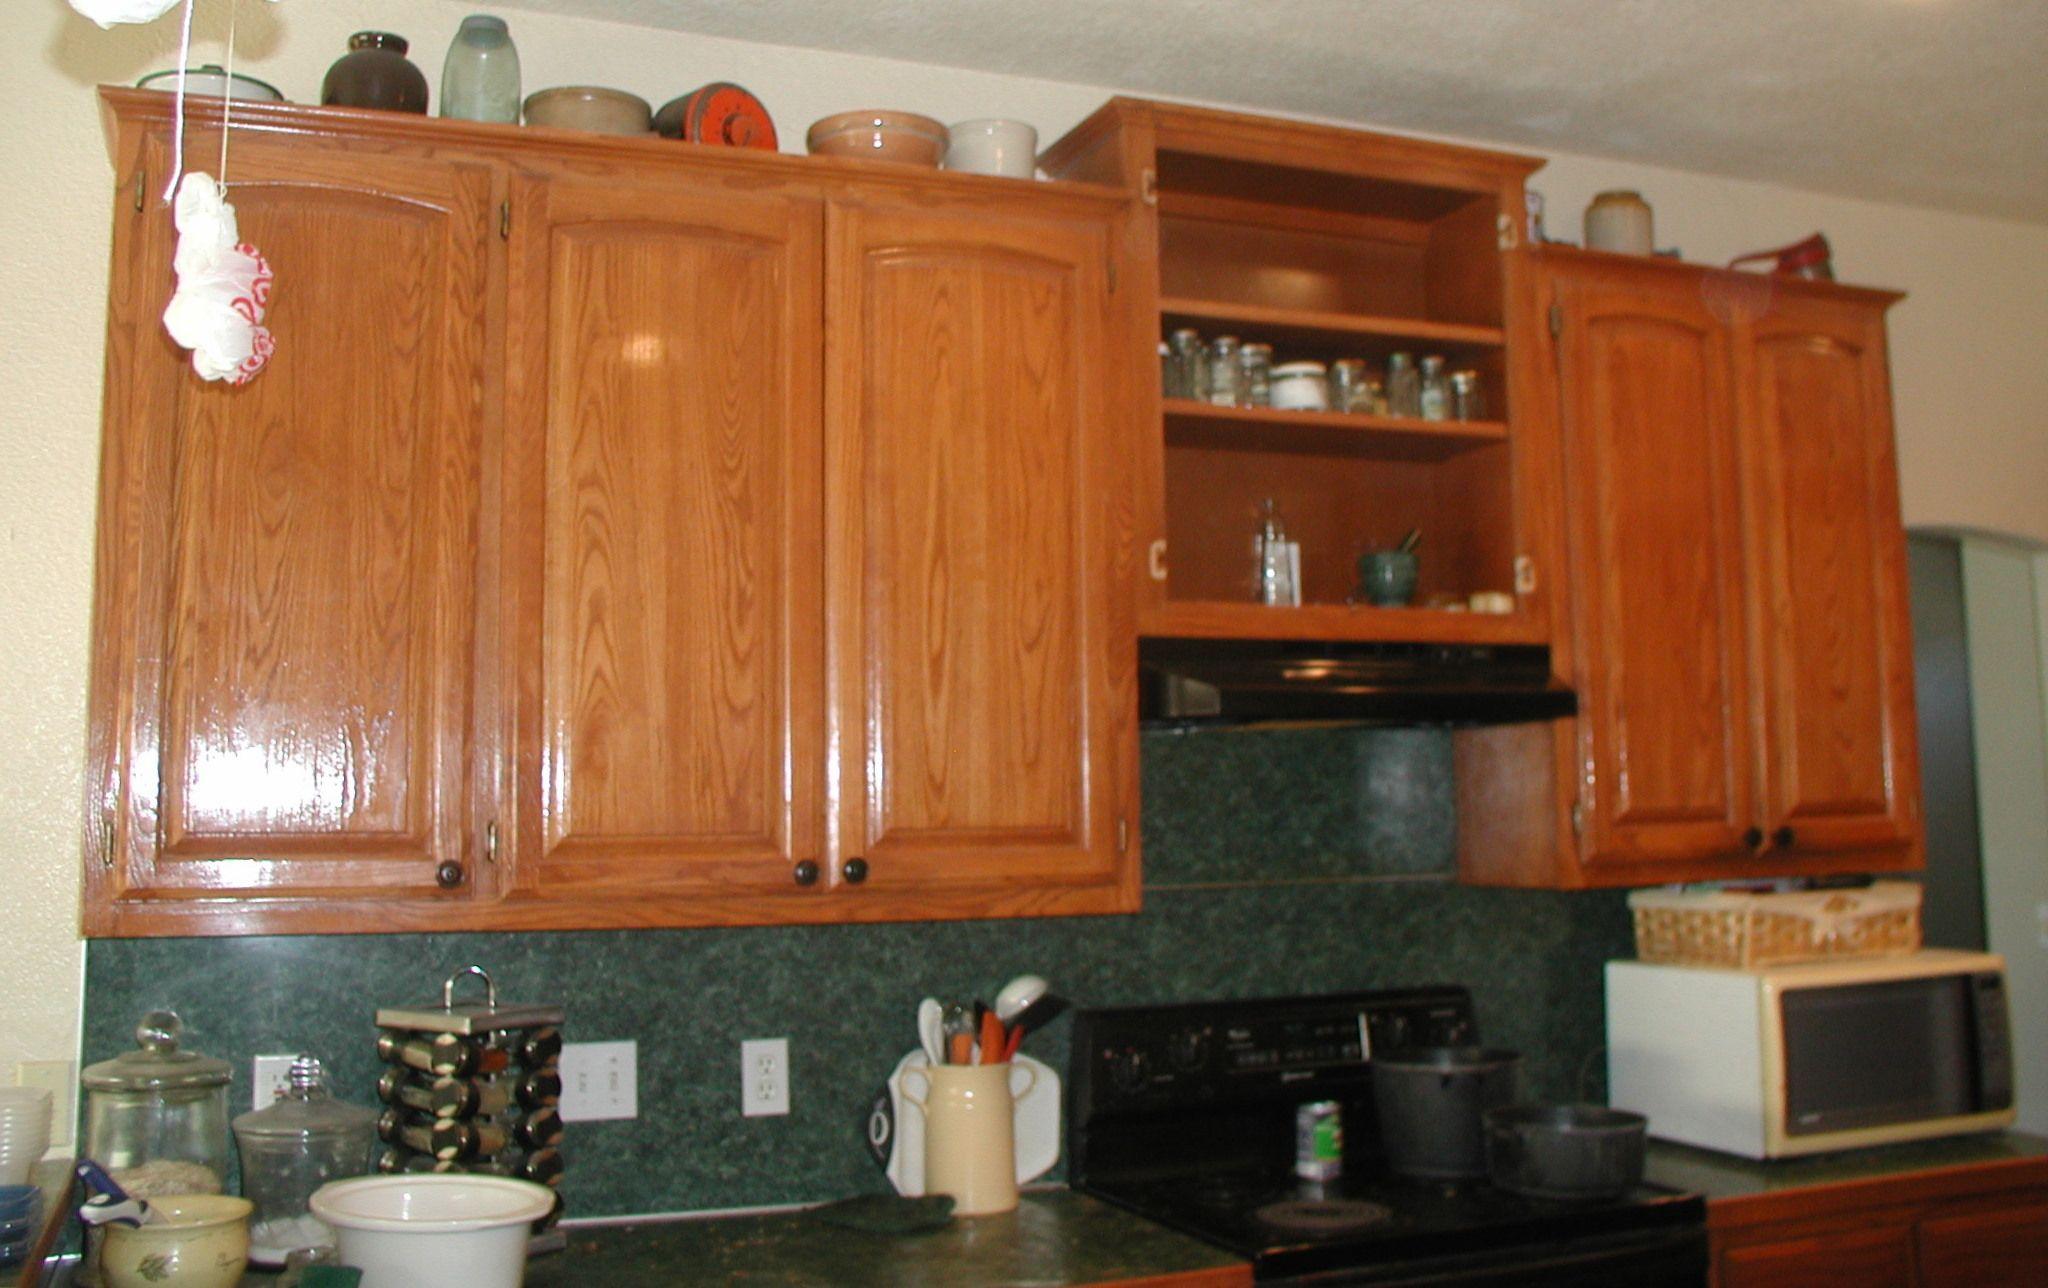 Kitchen Cabinets Upper Height Upper Kitchen Cabinets Above Counter Cliff Kitchen